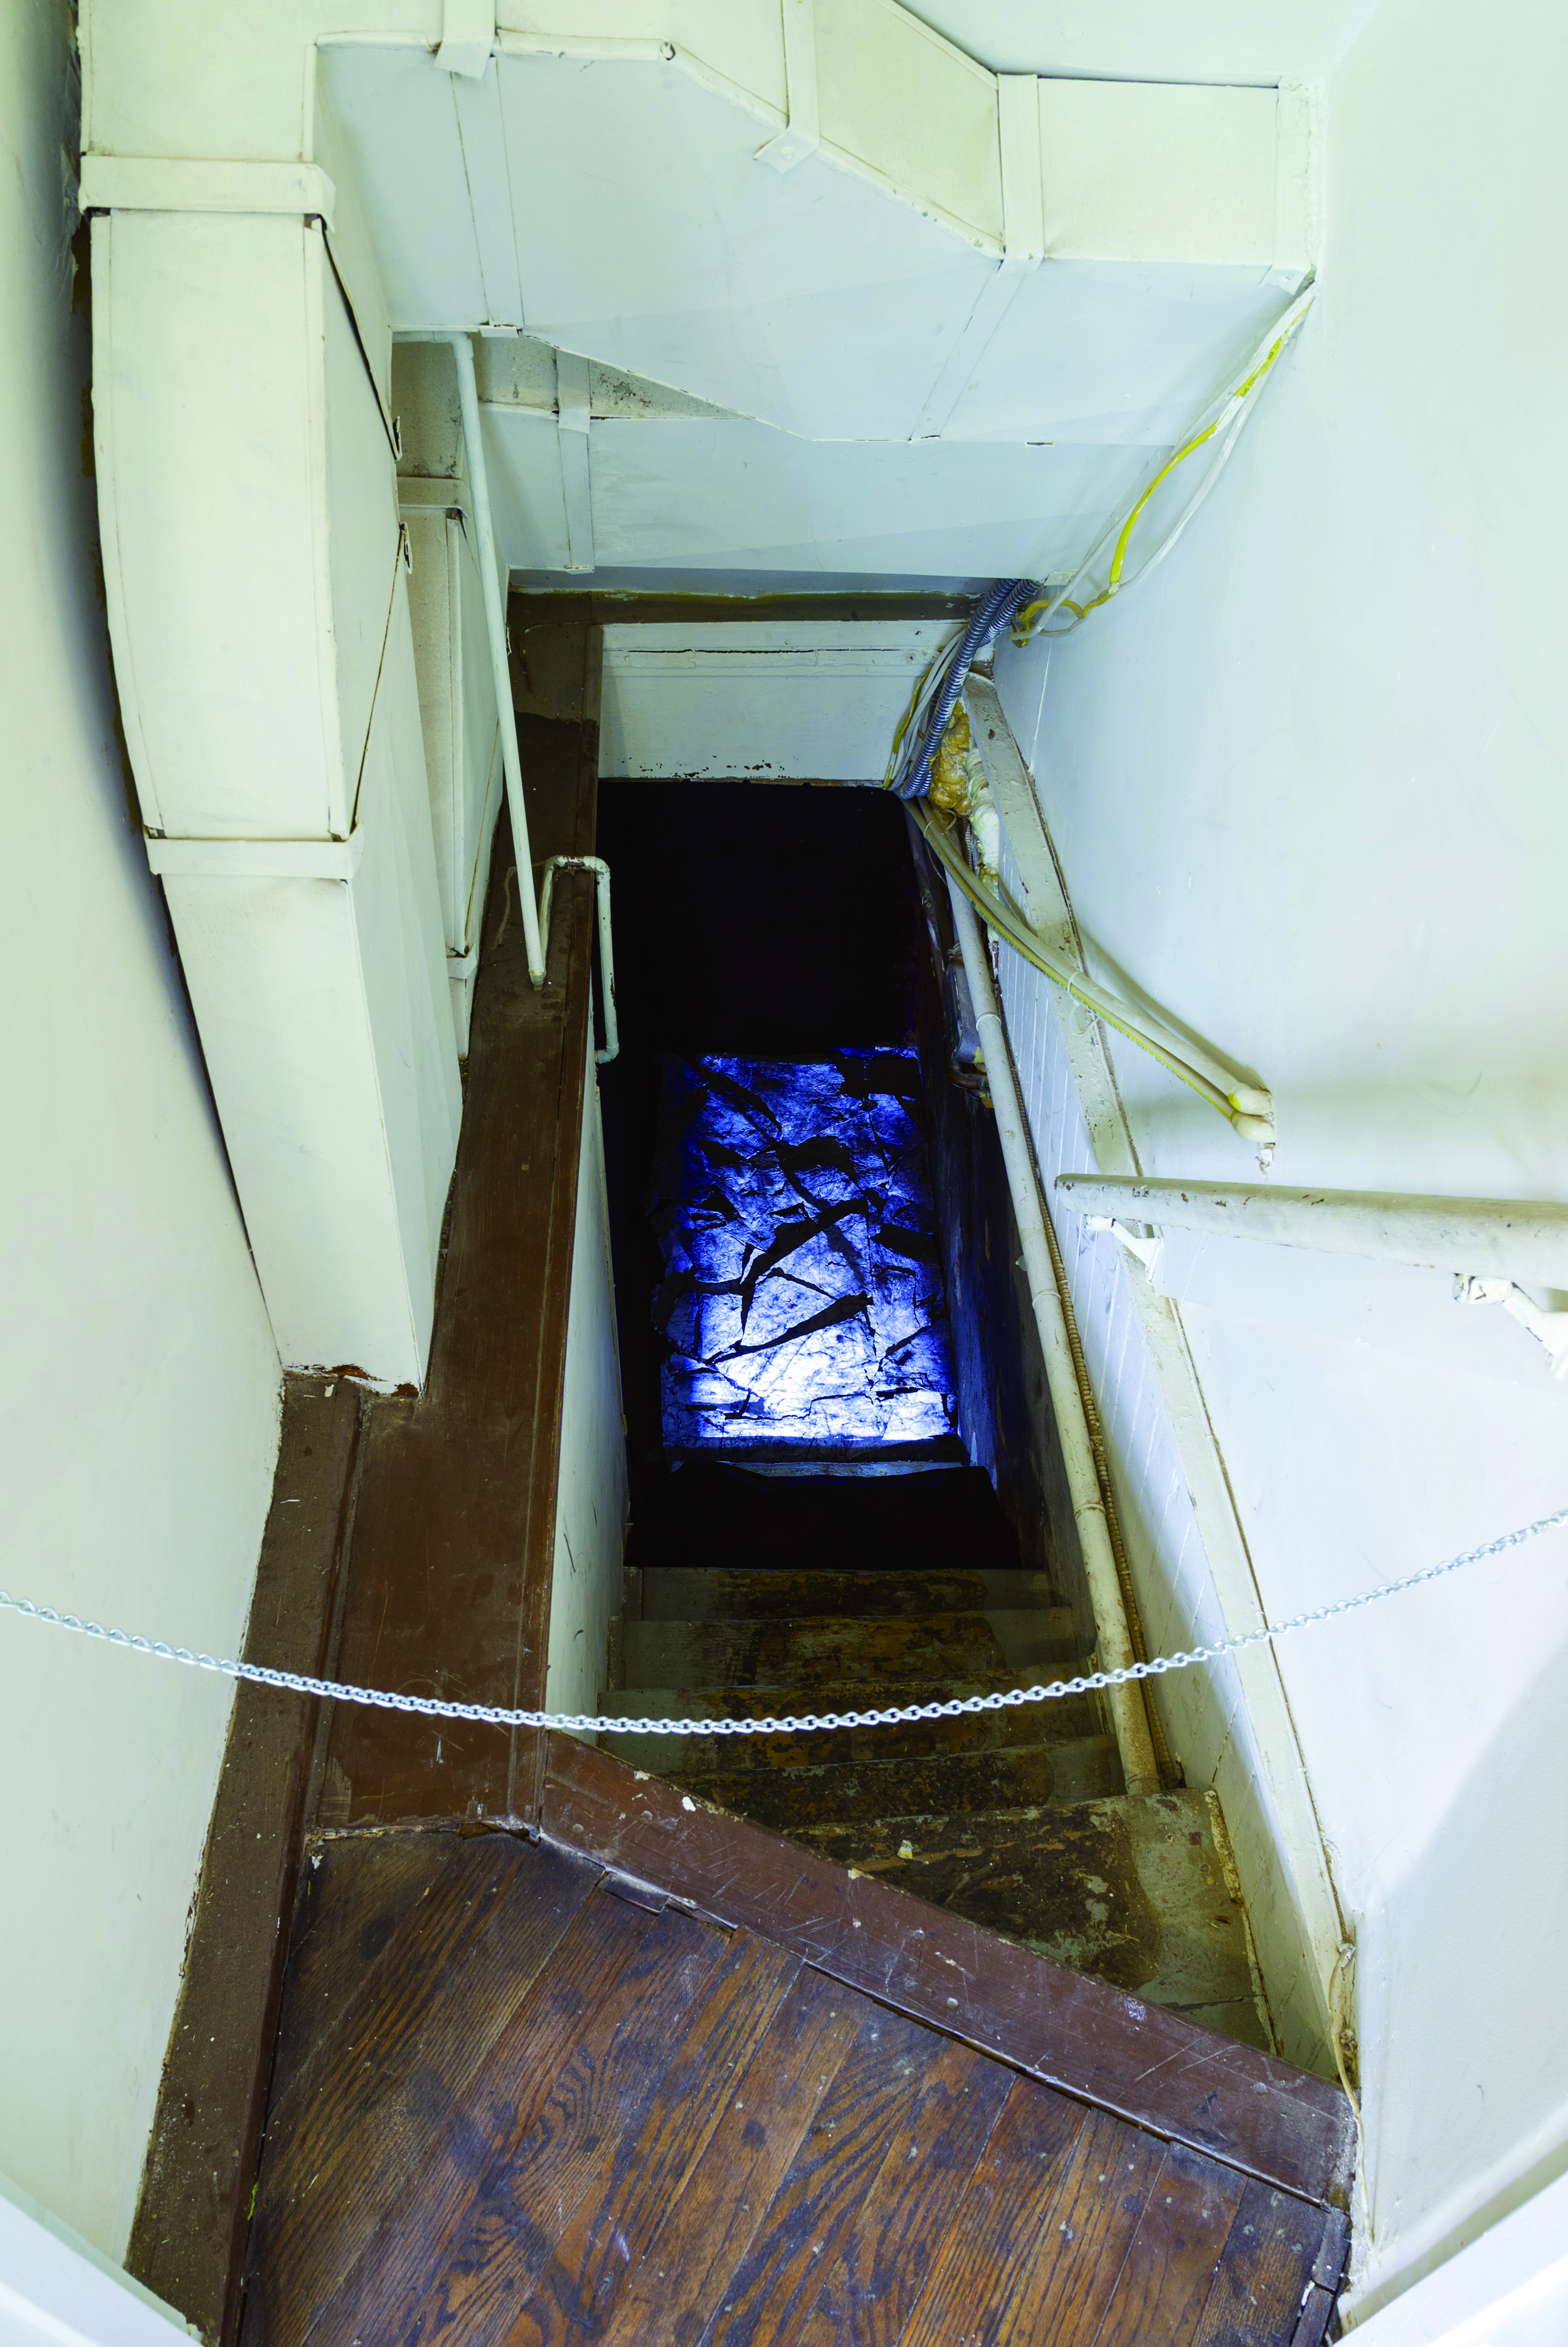 Noa Heyne,  Entropia,  2017. Video installation with concrete slabs. 16:9 format, 5:13 min.